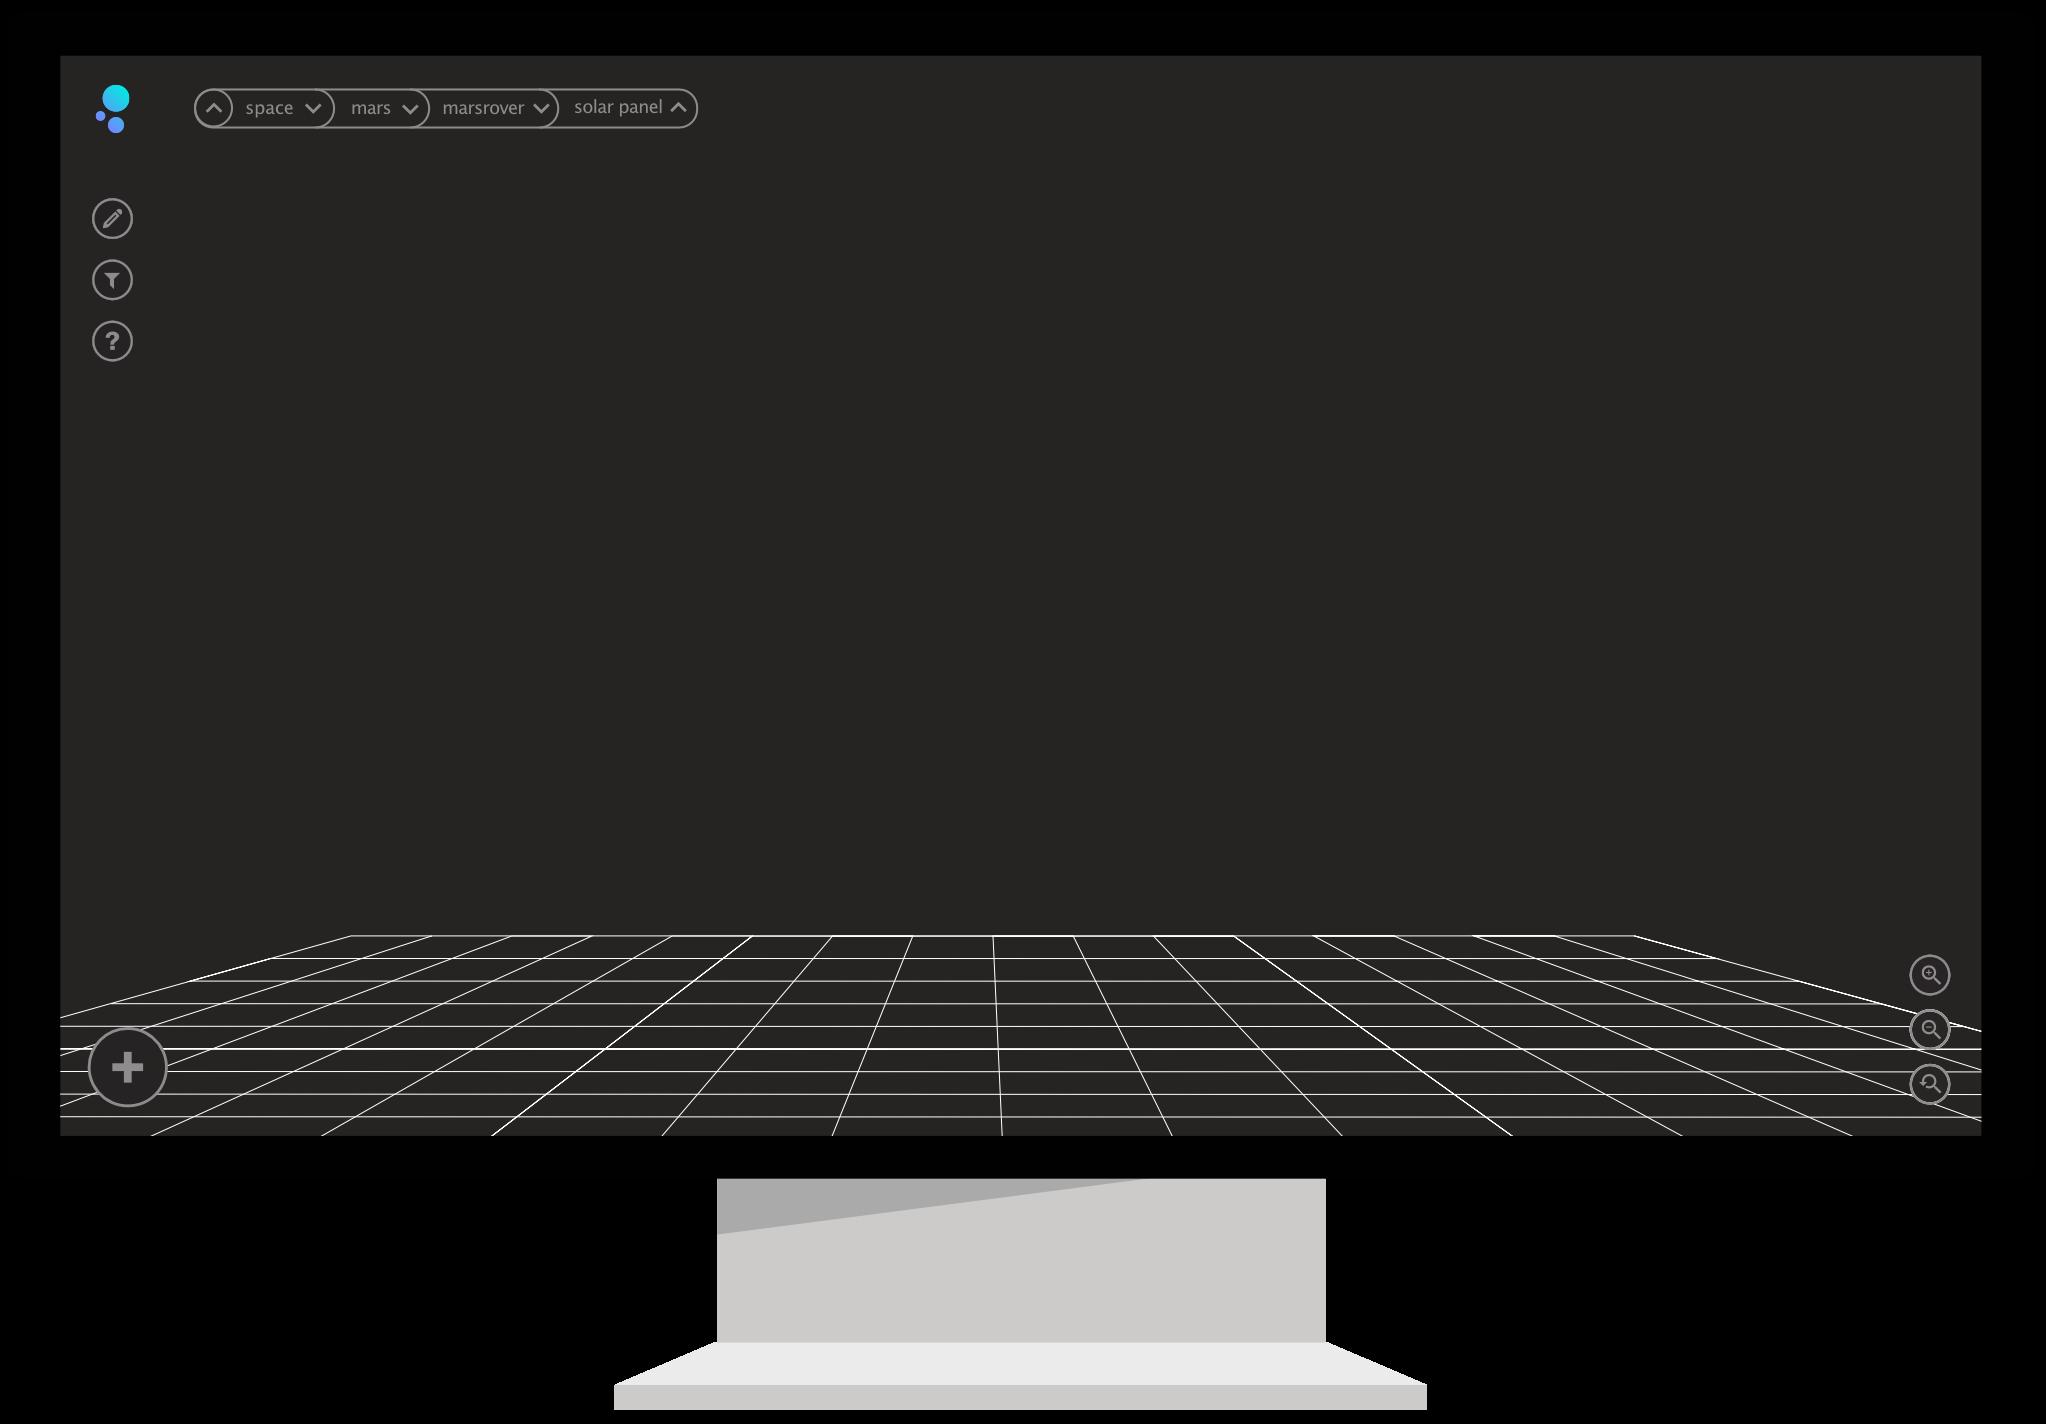 A Galactify 3d diagram